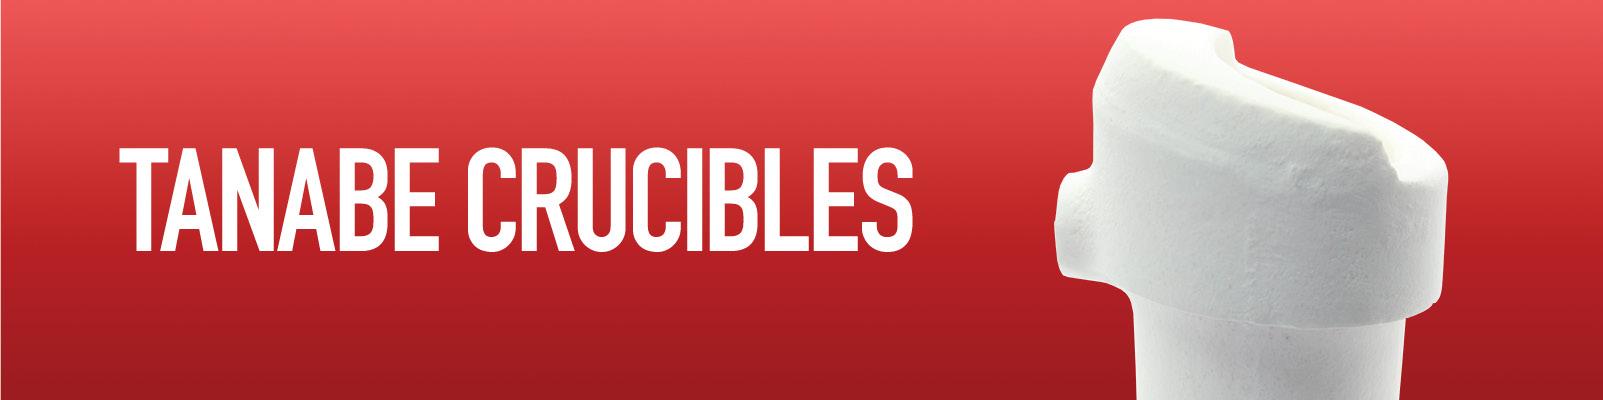 Tanabe Crucibles